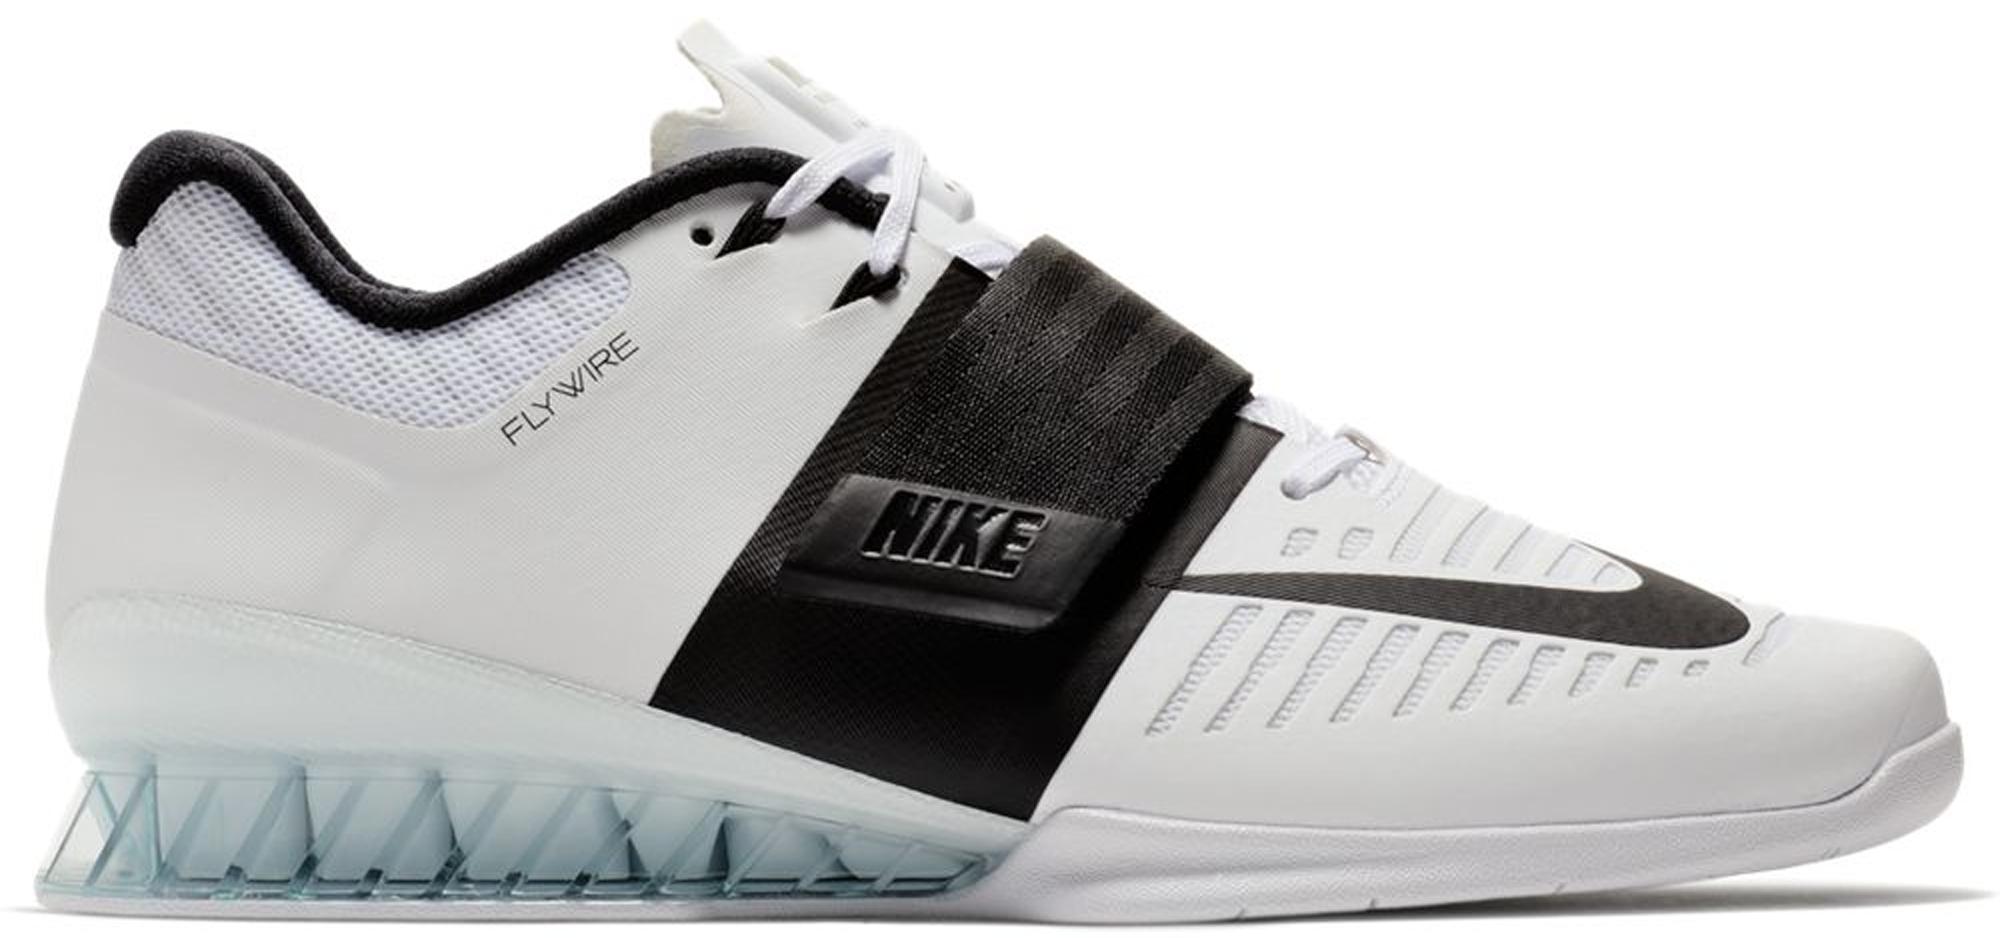 Nike Romaleos 3 White Black Clear Sole